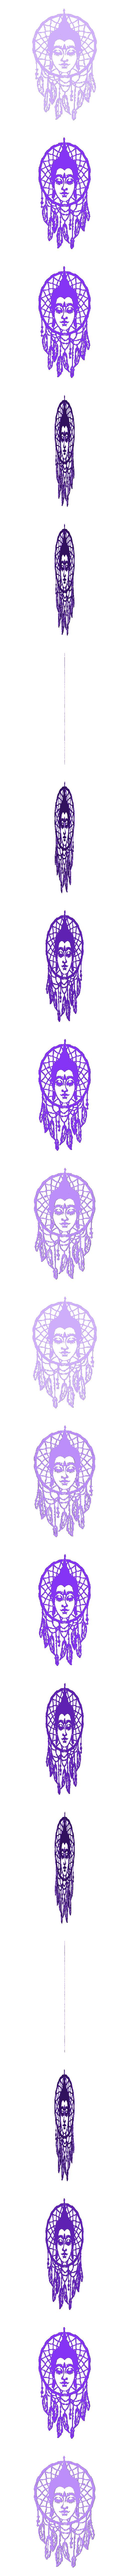 atrape bouda2.stl Download STL file atrape,bouda • Model to 3D print, jenemorel